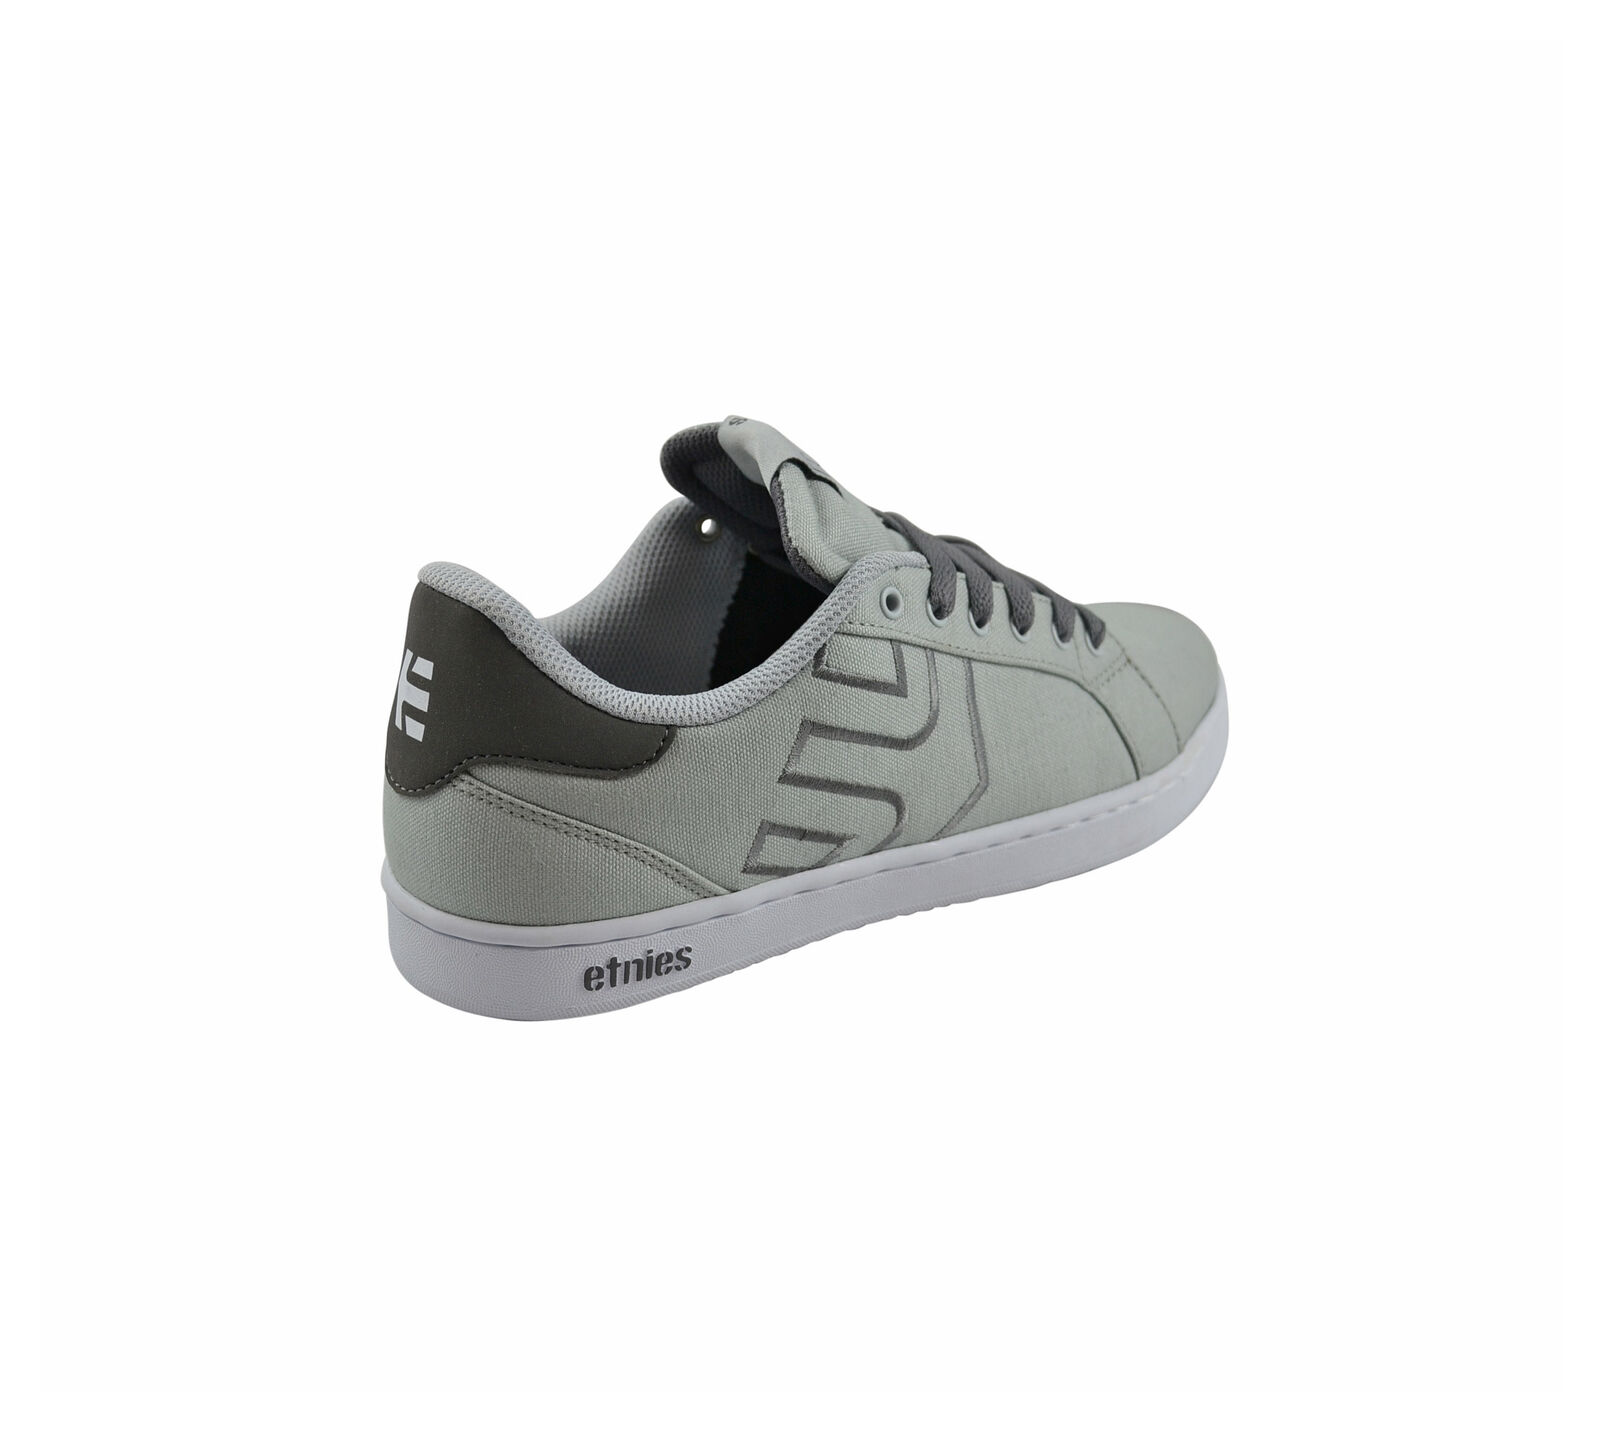 Etnies Fader LS light grey/dark grey Skater Sneaker/Schuhe grau